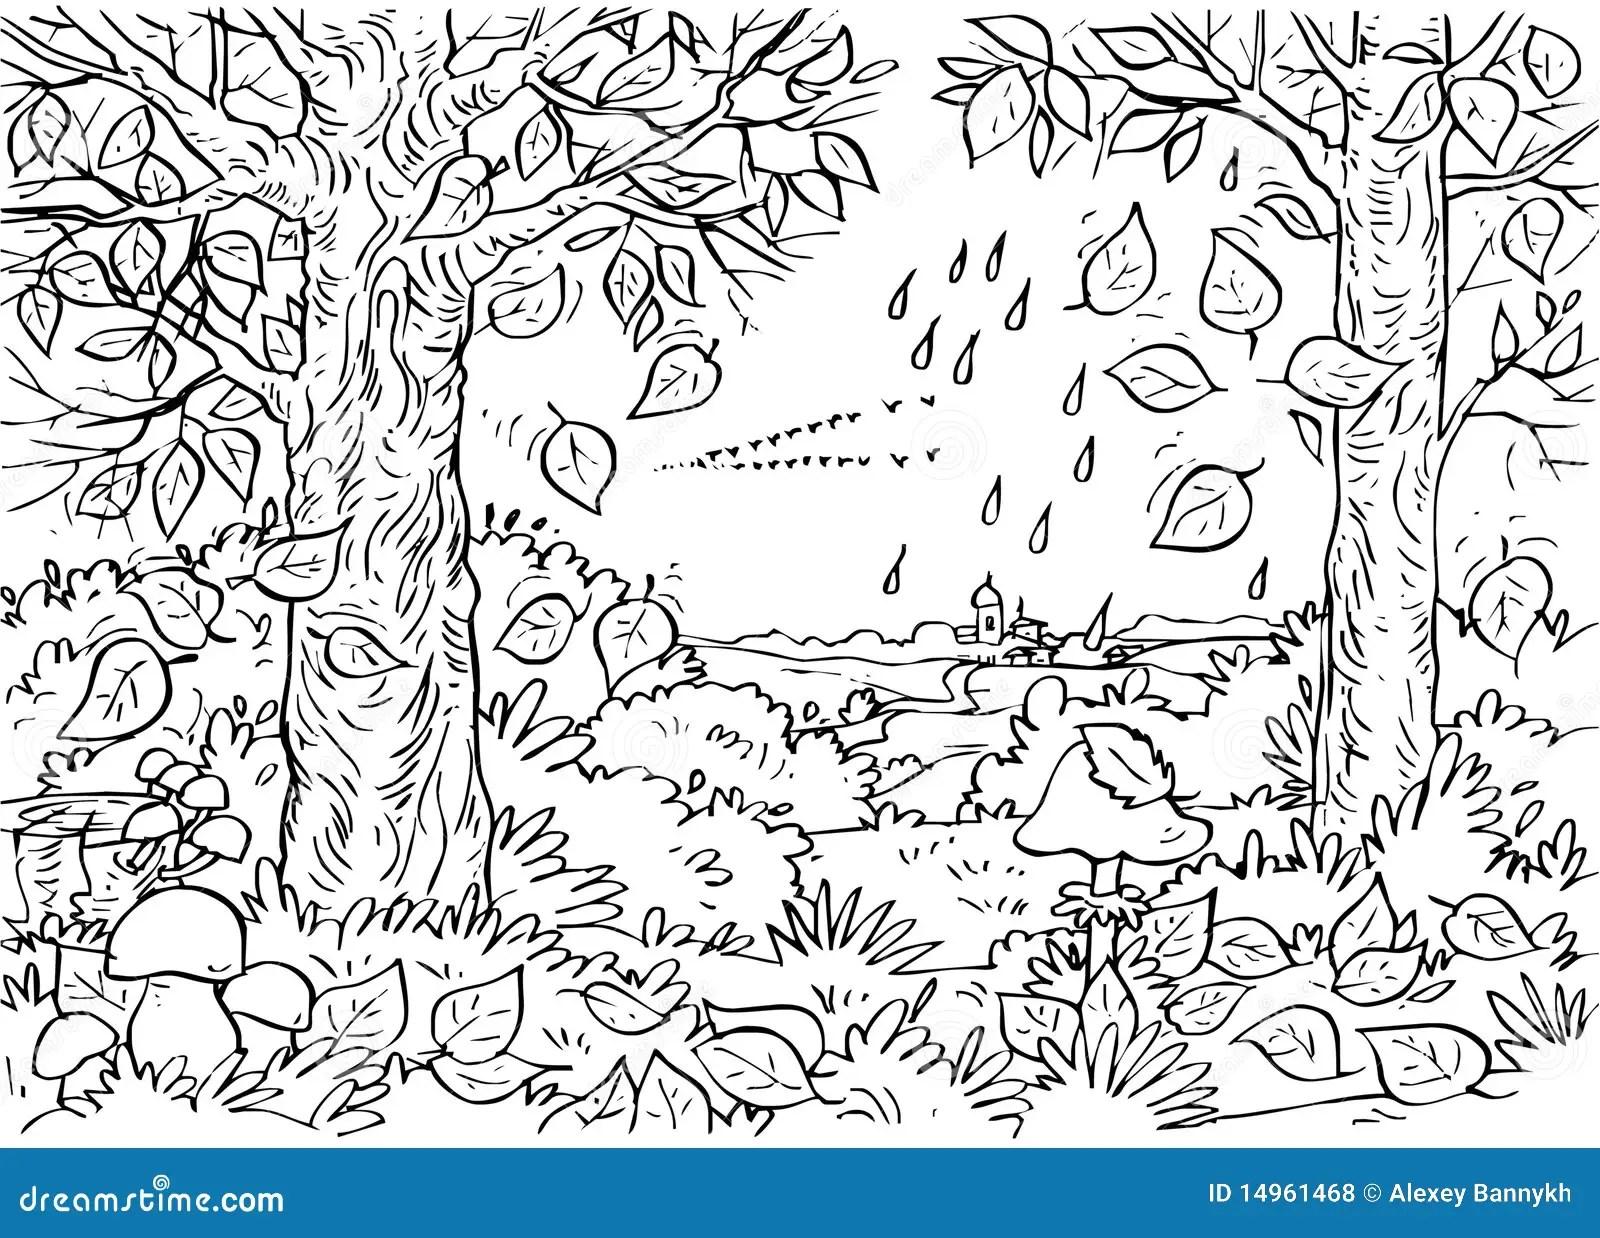 Forest in autumn stock illustration. Illustration of